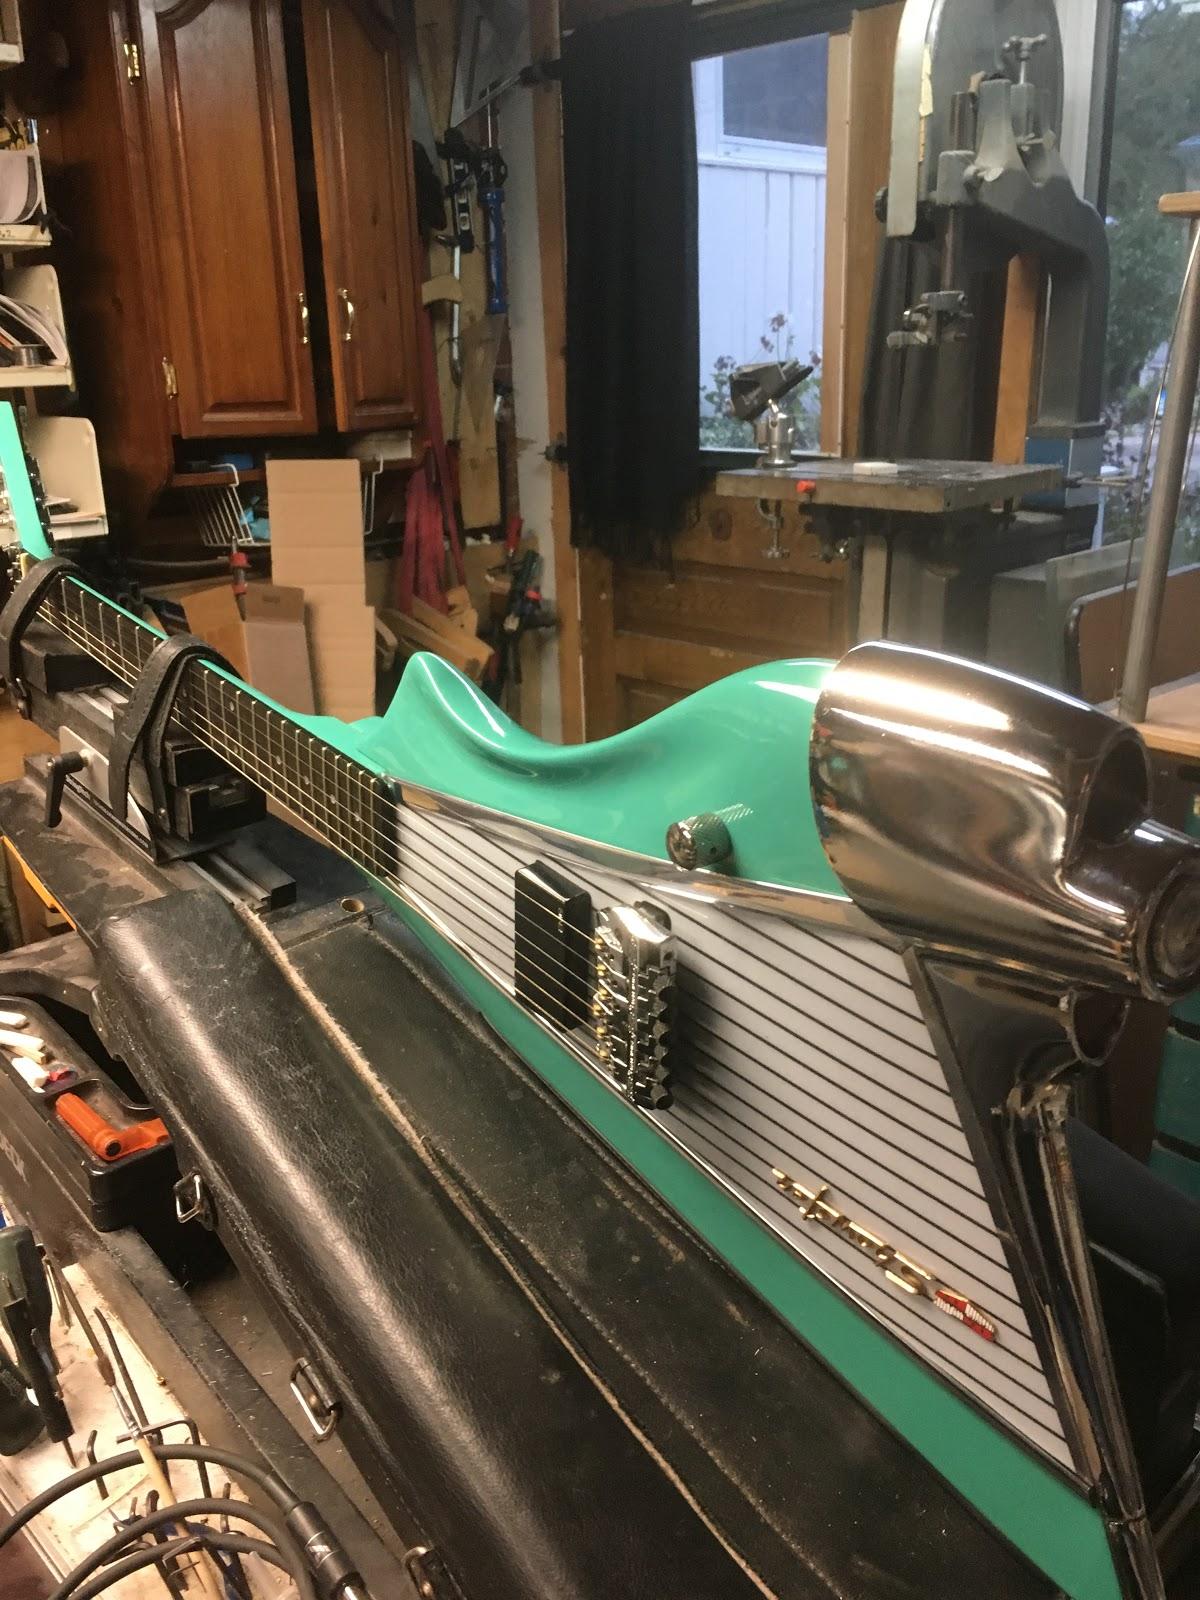 McConville Guitars / Guitar Repair and Design Courses